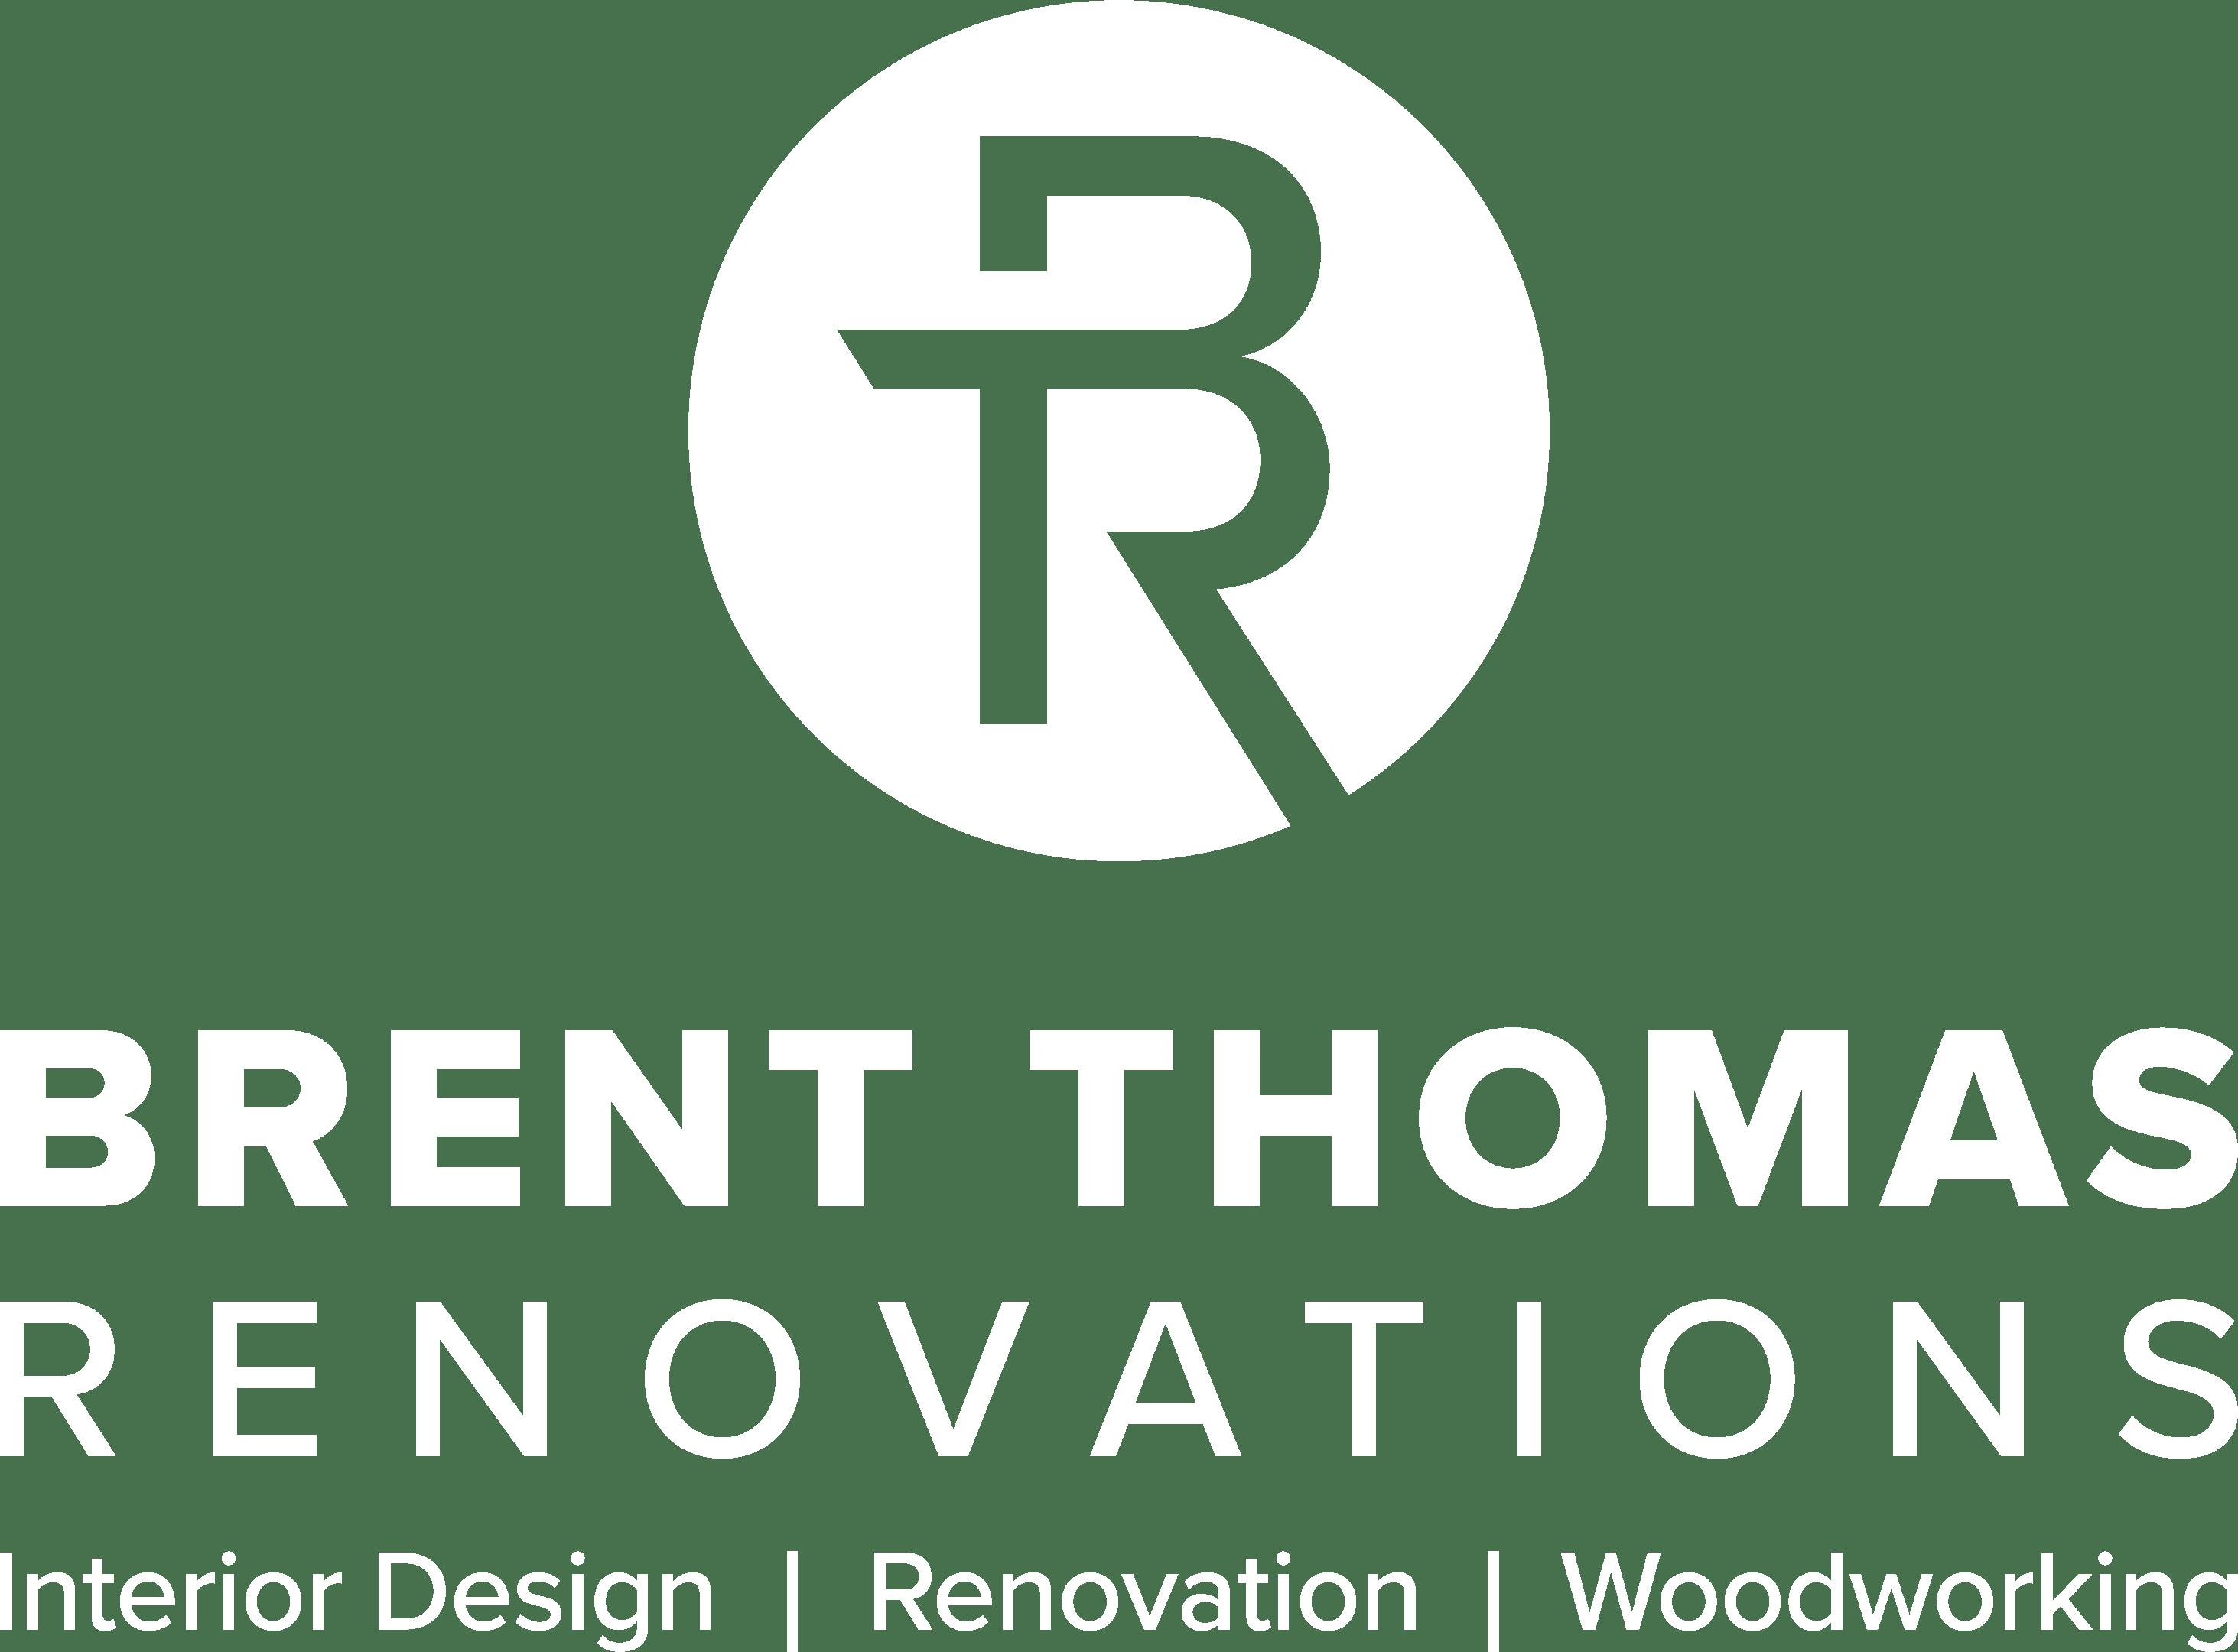 Brent Thomas Renovations